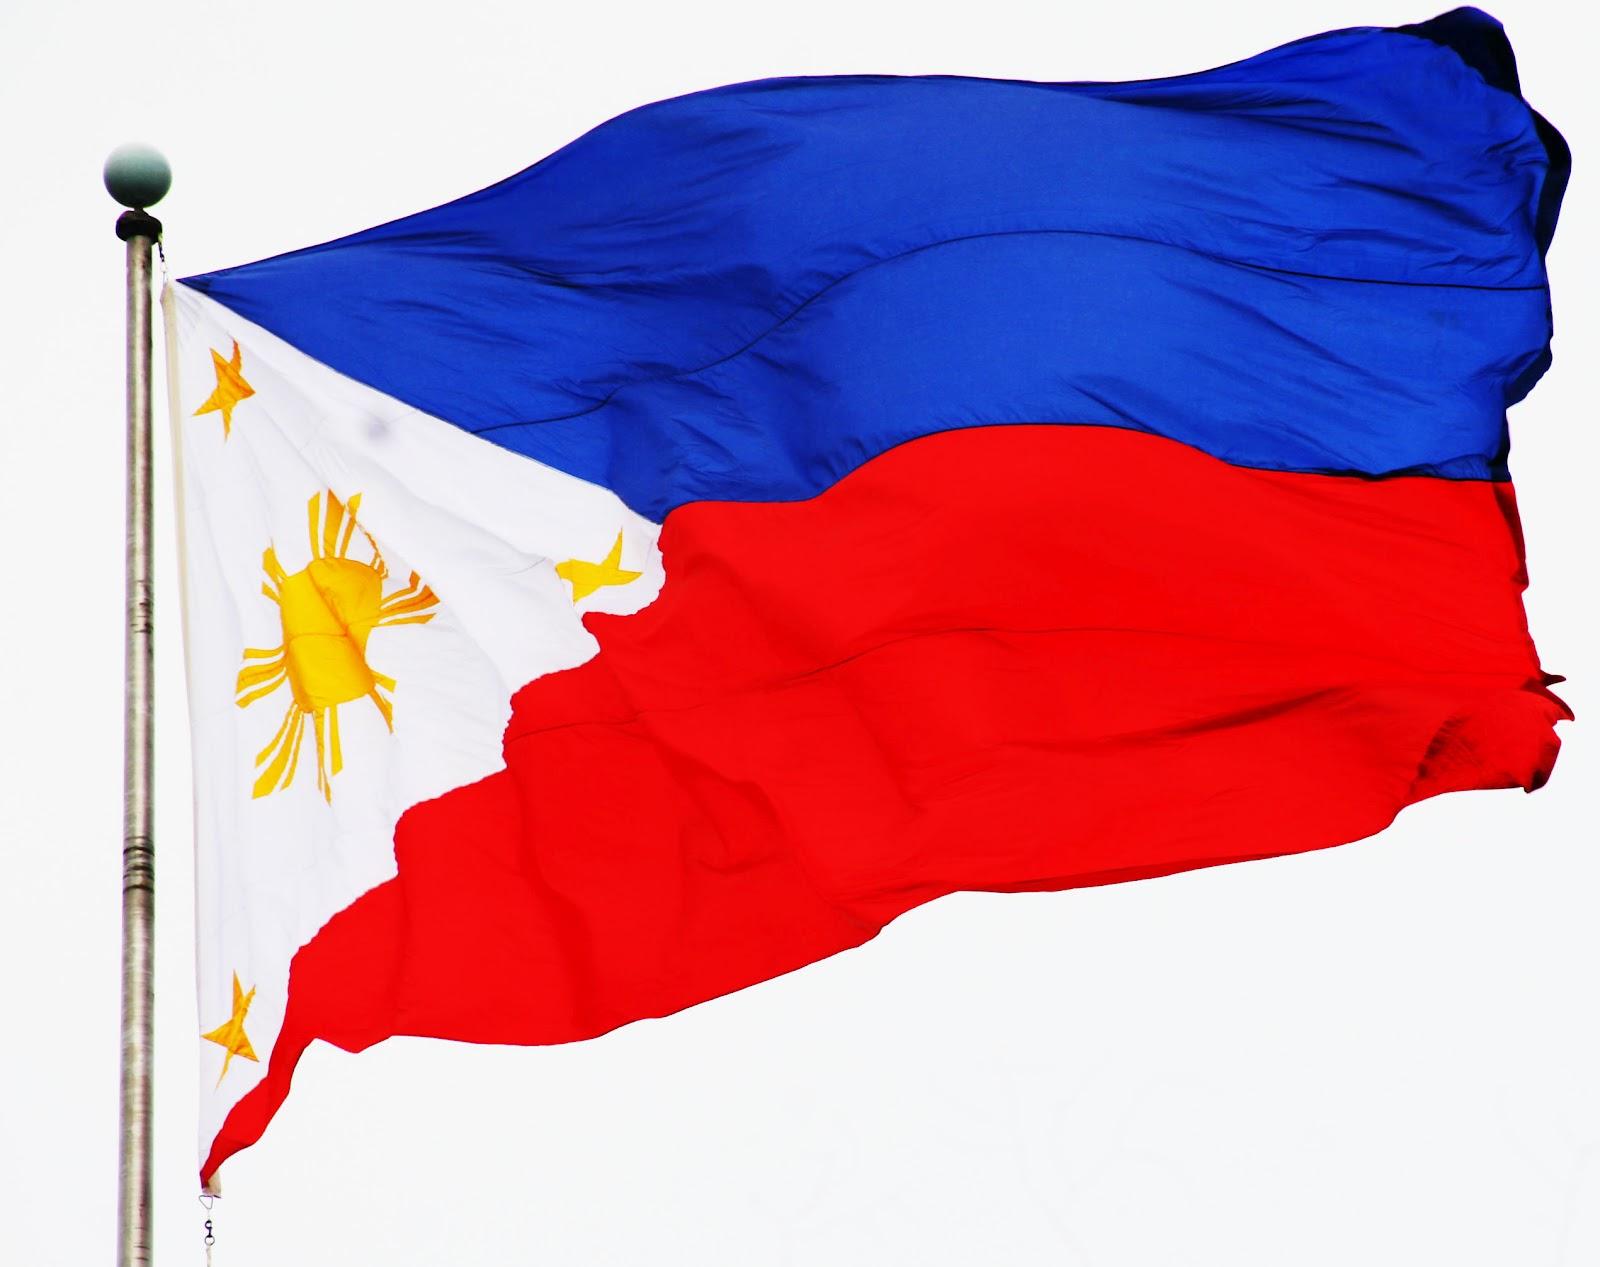 clip art philippine flag - photo #6